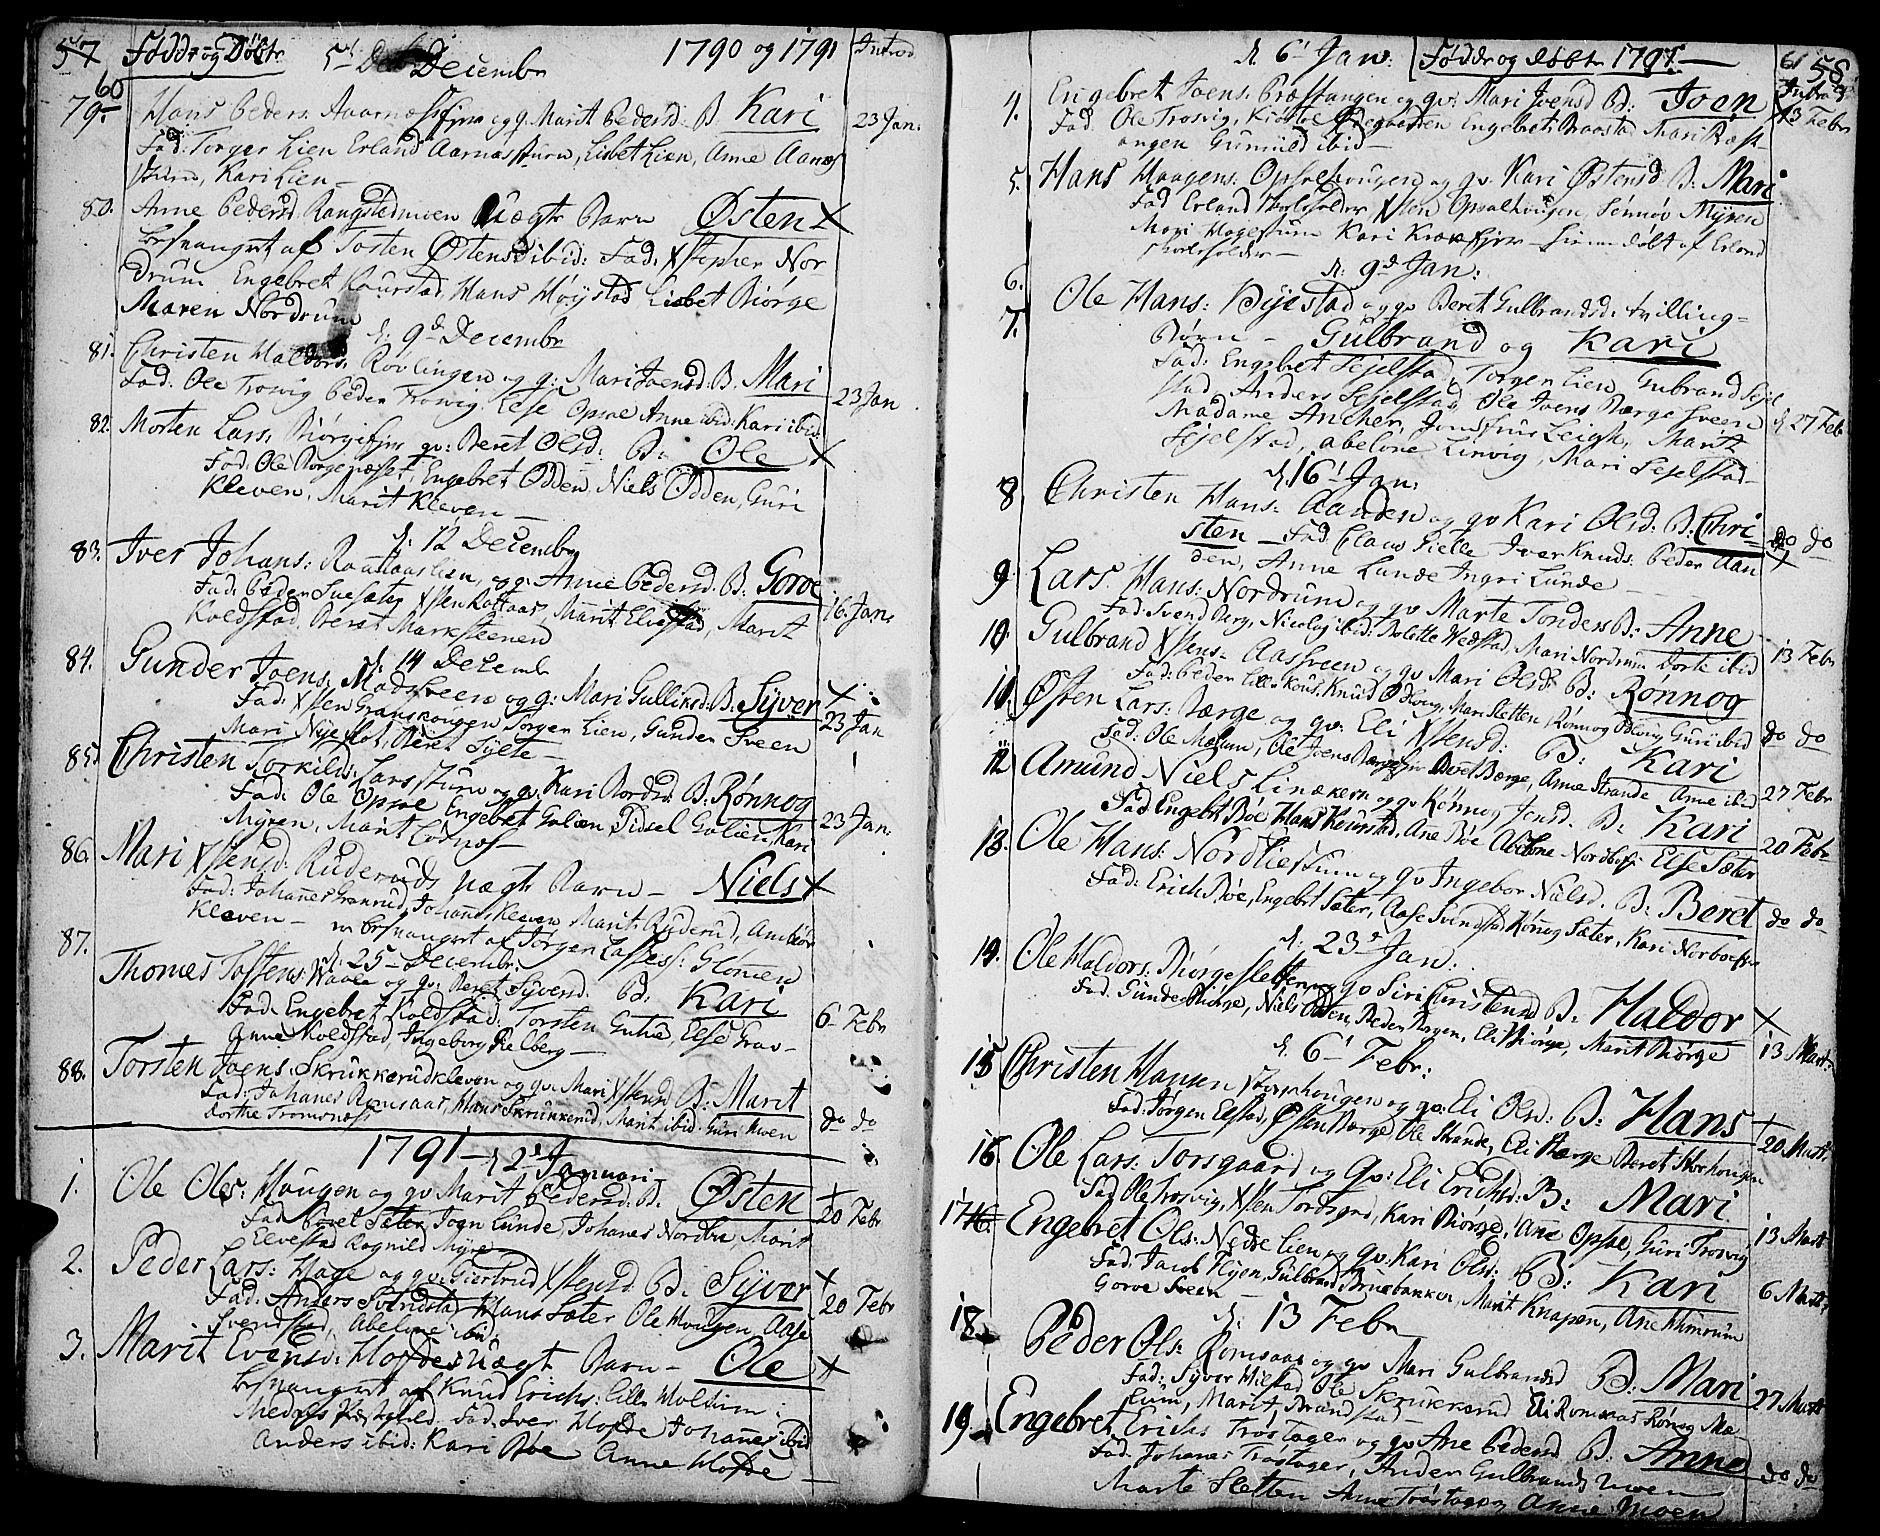 SAH, Ringebu prestekontor, Ministerialbok nr. 3, 1781-1820, s. 60-61